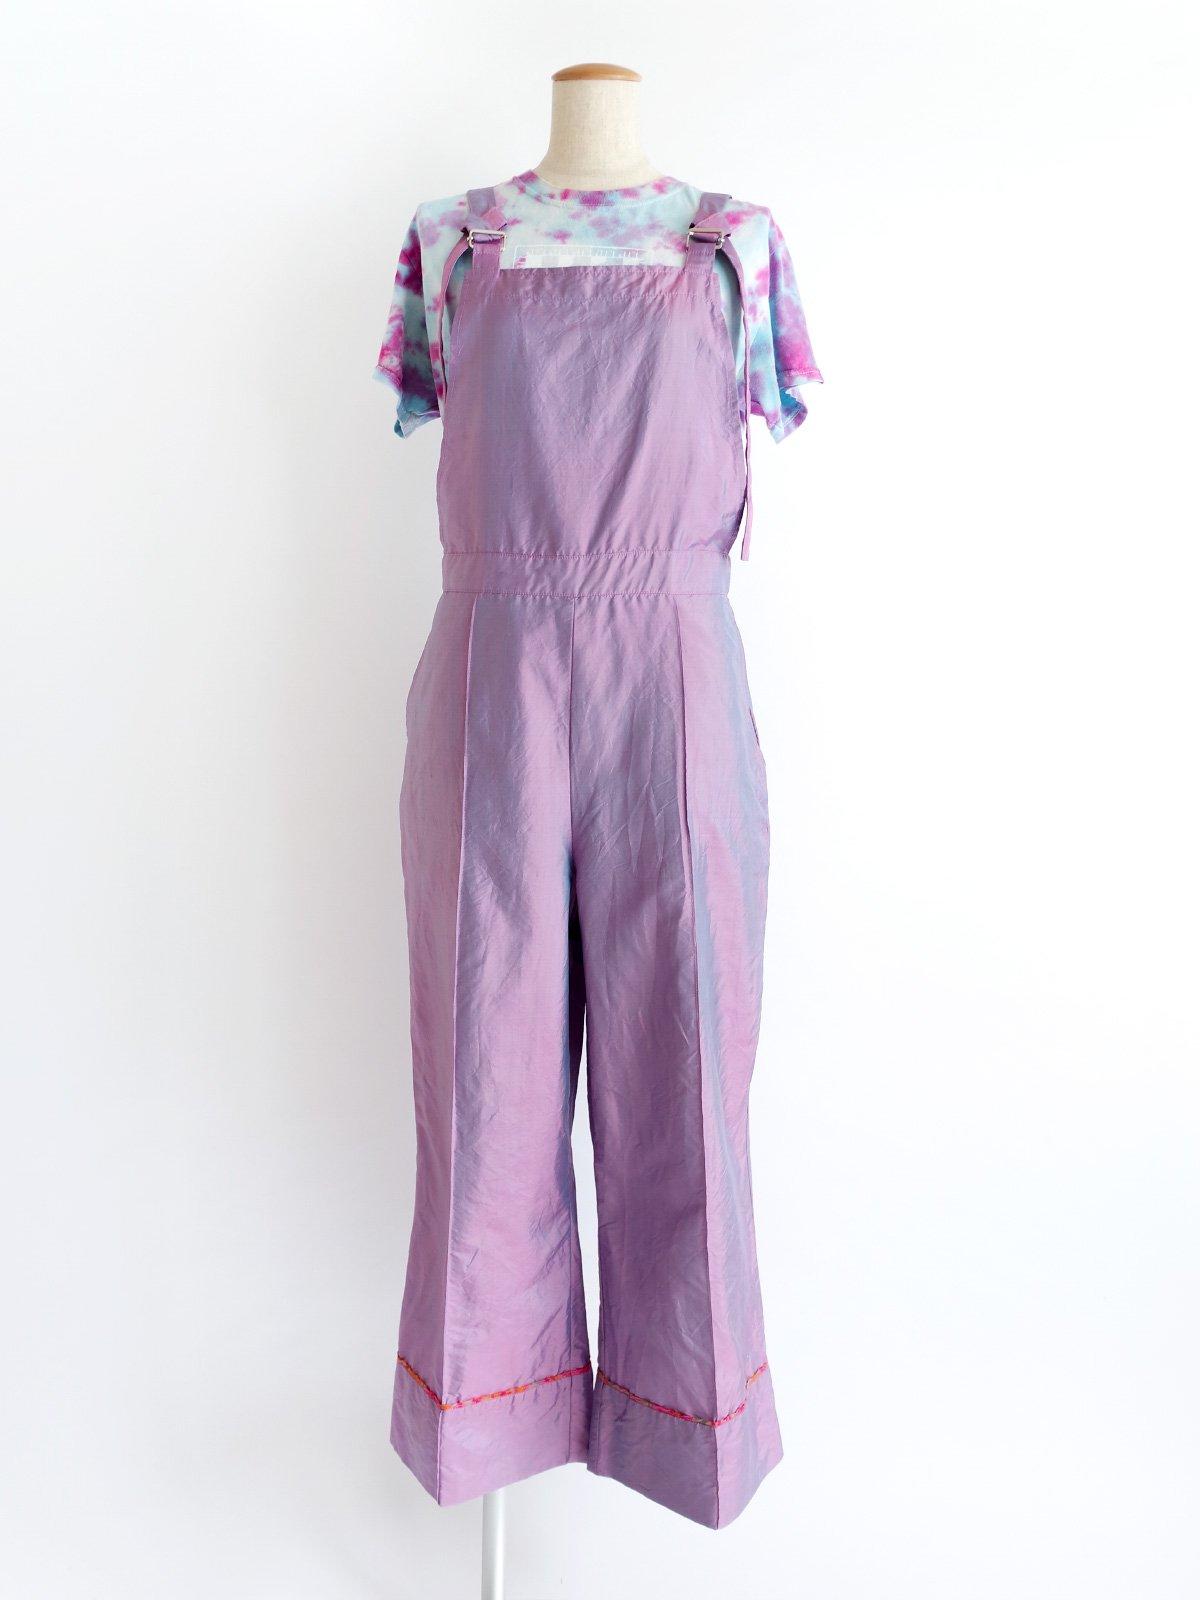 Salopette / pink blue